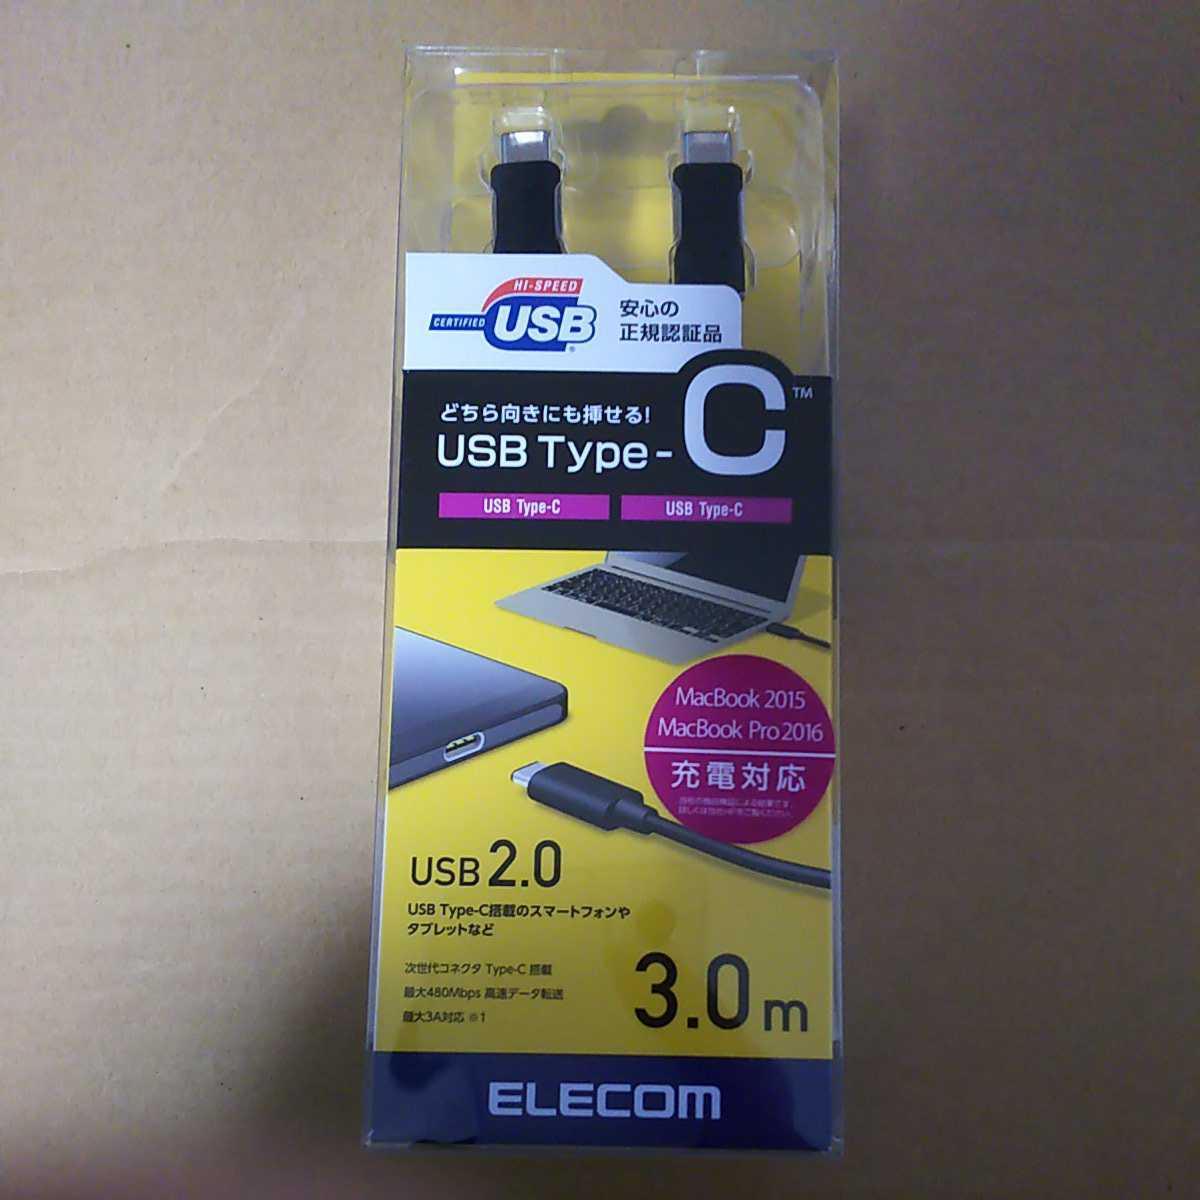 ◆ELECOM USB2.0 Type-Cケーブル(認証品、C-C)/3.0m ブラック 3.0m U2C-CC30NBK